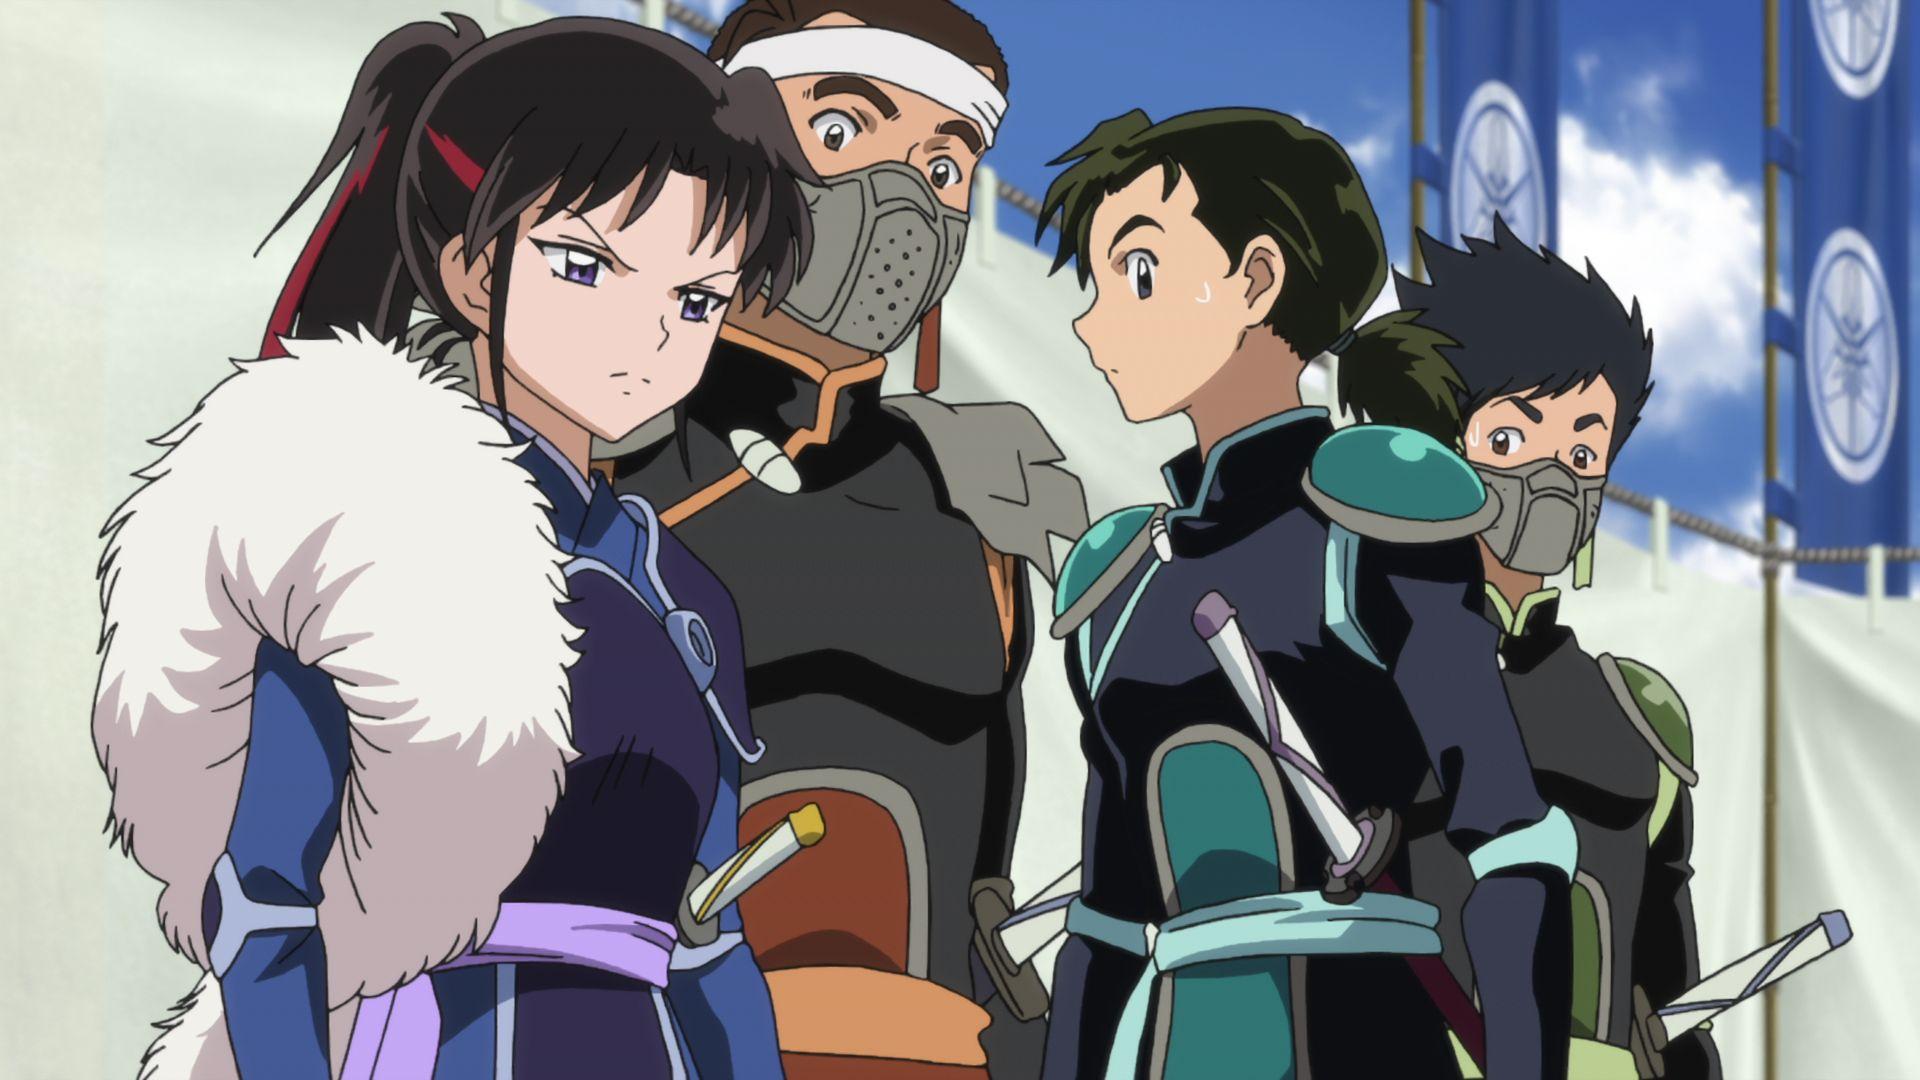 TVアニメ「半妖の夜叉姫」第19話先行カット